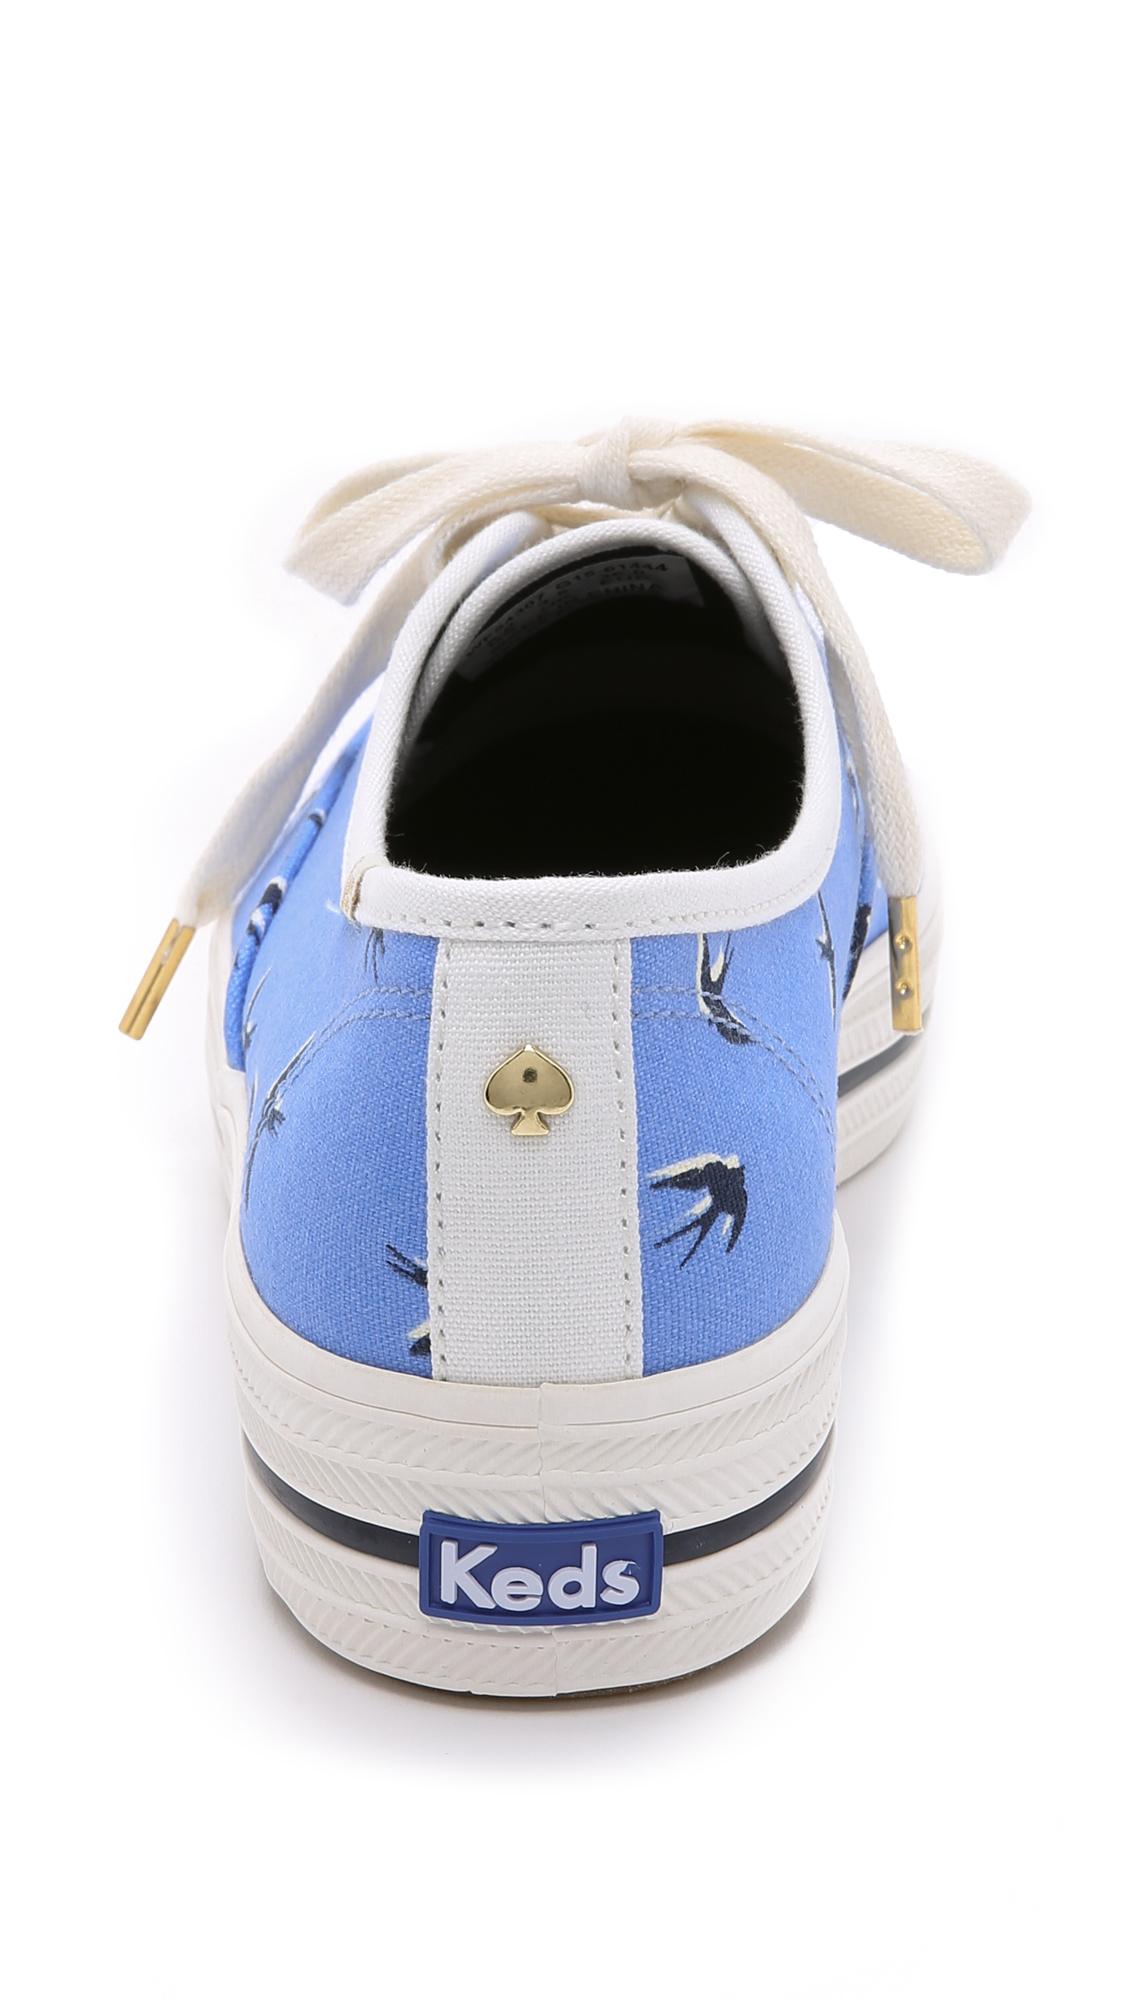 920ffdcc36d9 Kate Spade New York Keds for Kate Spade Triple Kick Swallow Sneakers ...